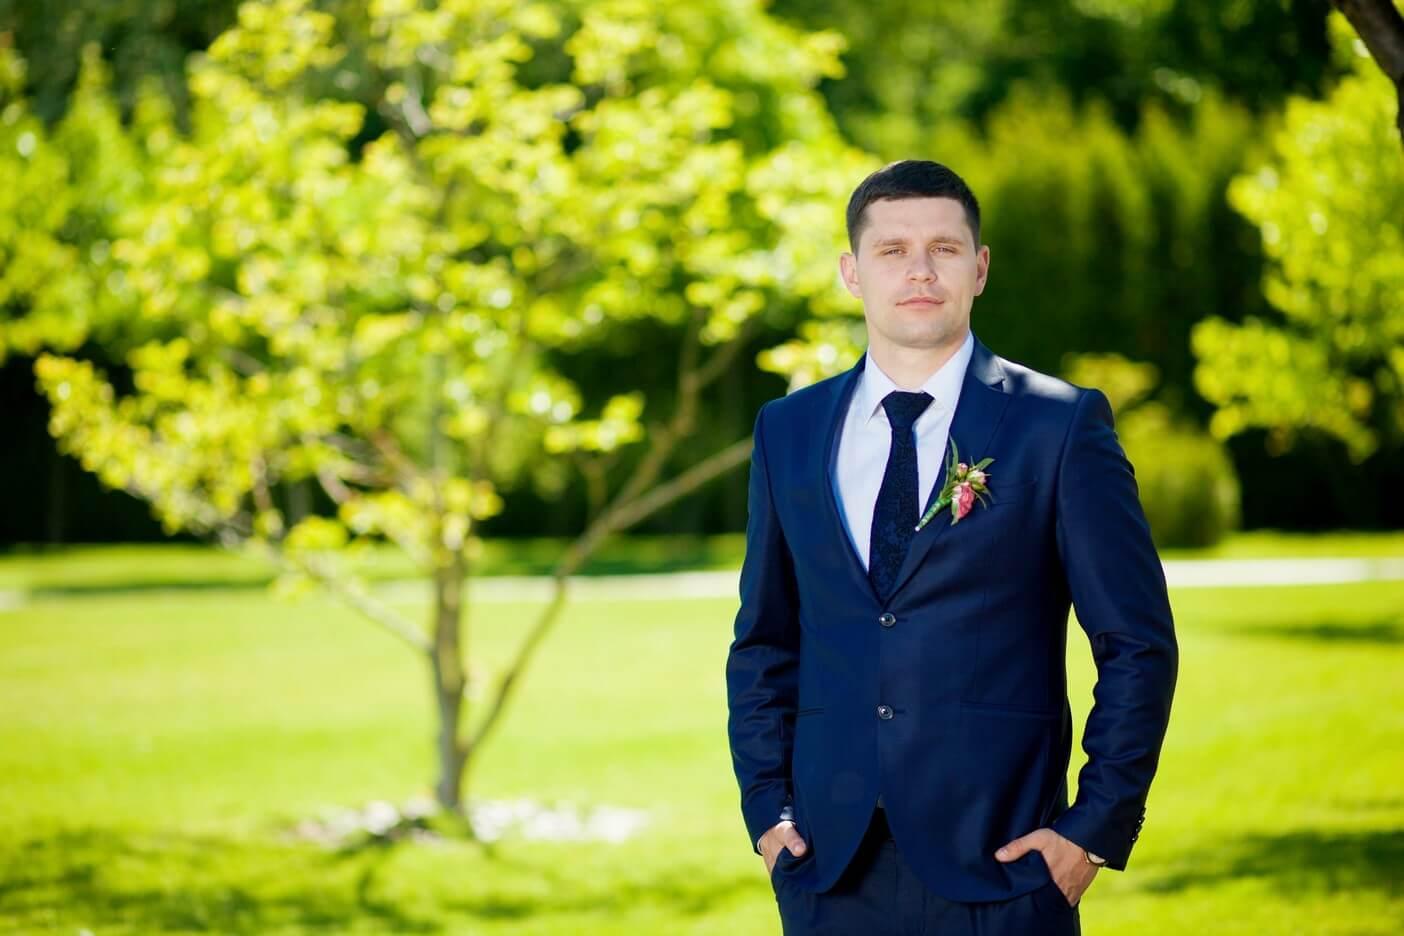 professional'nyj fotograf kiev ceny fotosessii kiev ceny fotograf na svad'bu v kieve (5)